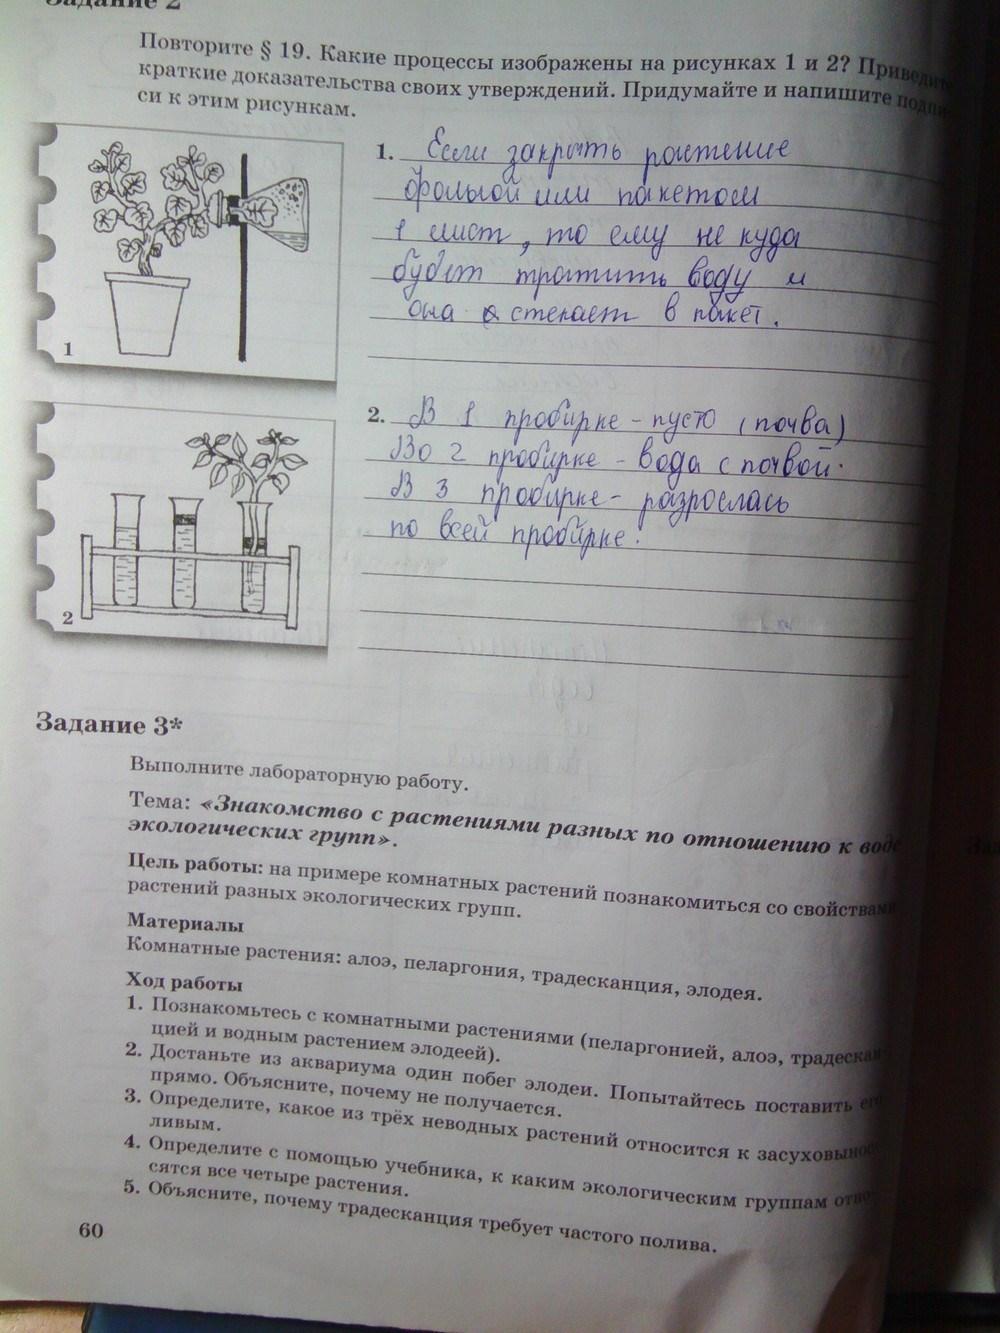 Решебник 6 класса по биологии пономарева корнилова кучменко